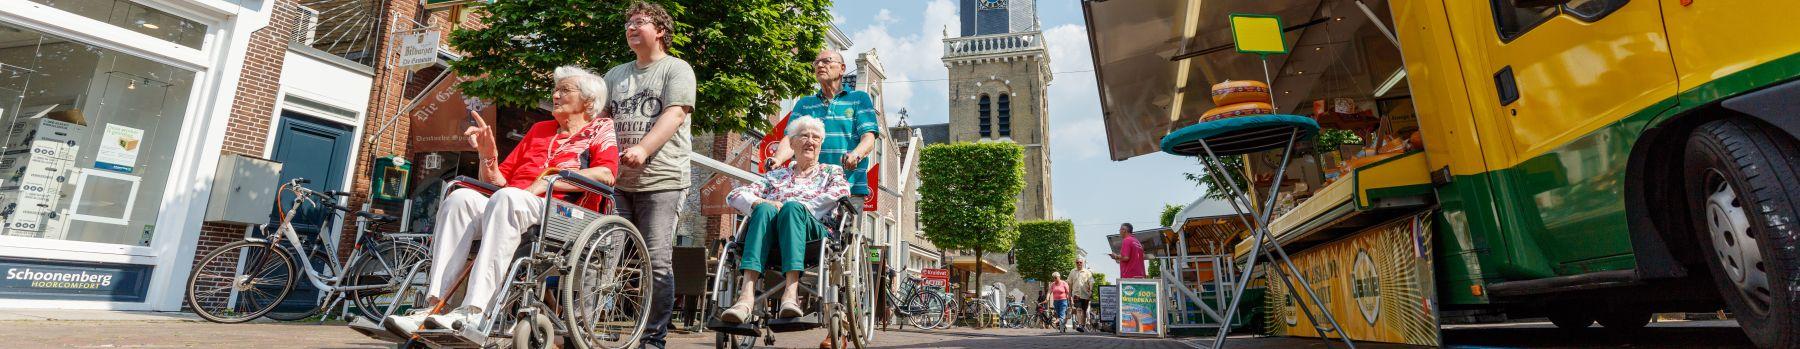 Woonzorgcentrum Sint Theresia in Joure